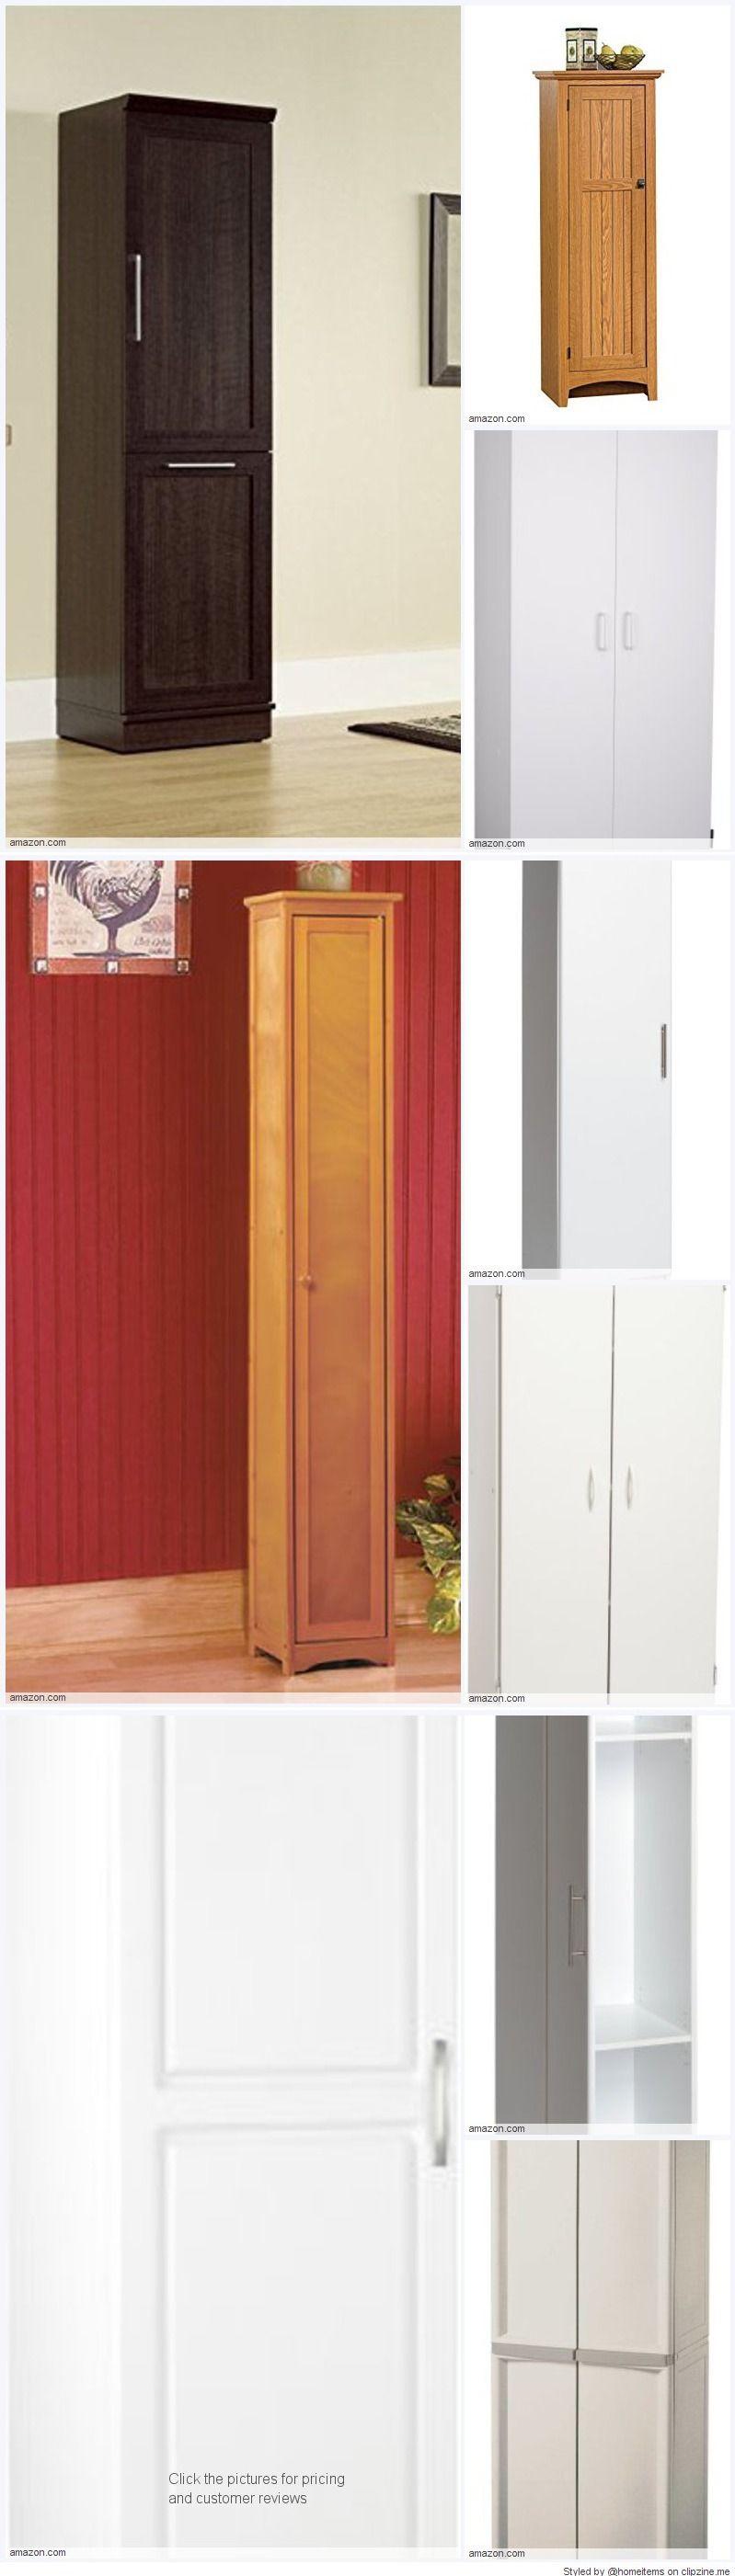 Free Standing Broom Closet Cabinet For The Kitchen Or Garage Trendy Kitchen Kitchen Design Color Kitchen Pantries Diy